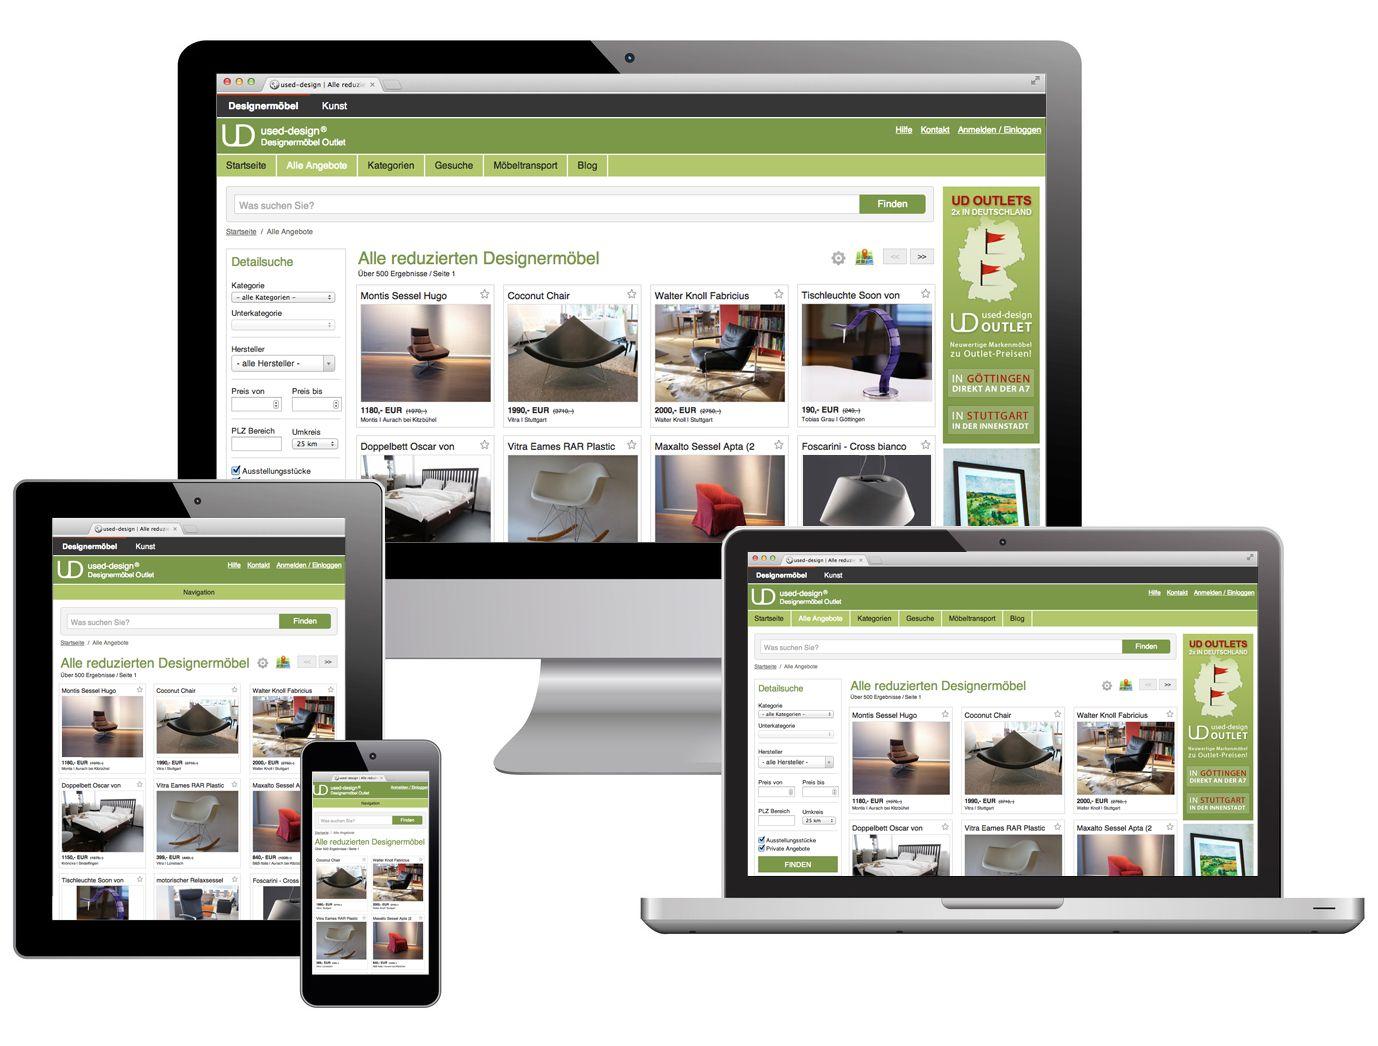 gebrauchte designer möbel kollektion images der dcbeabcaf jpg